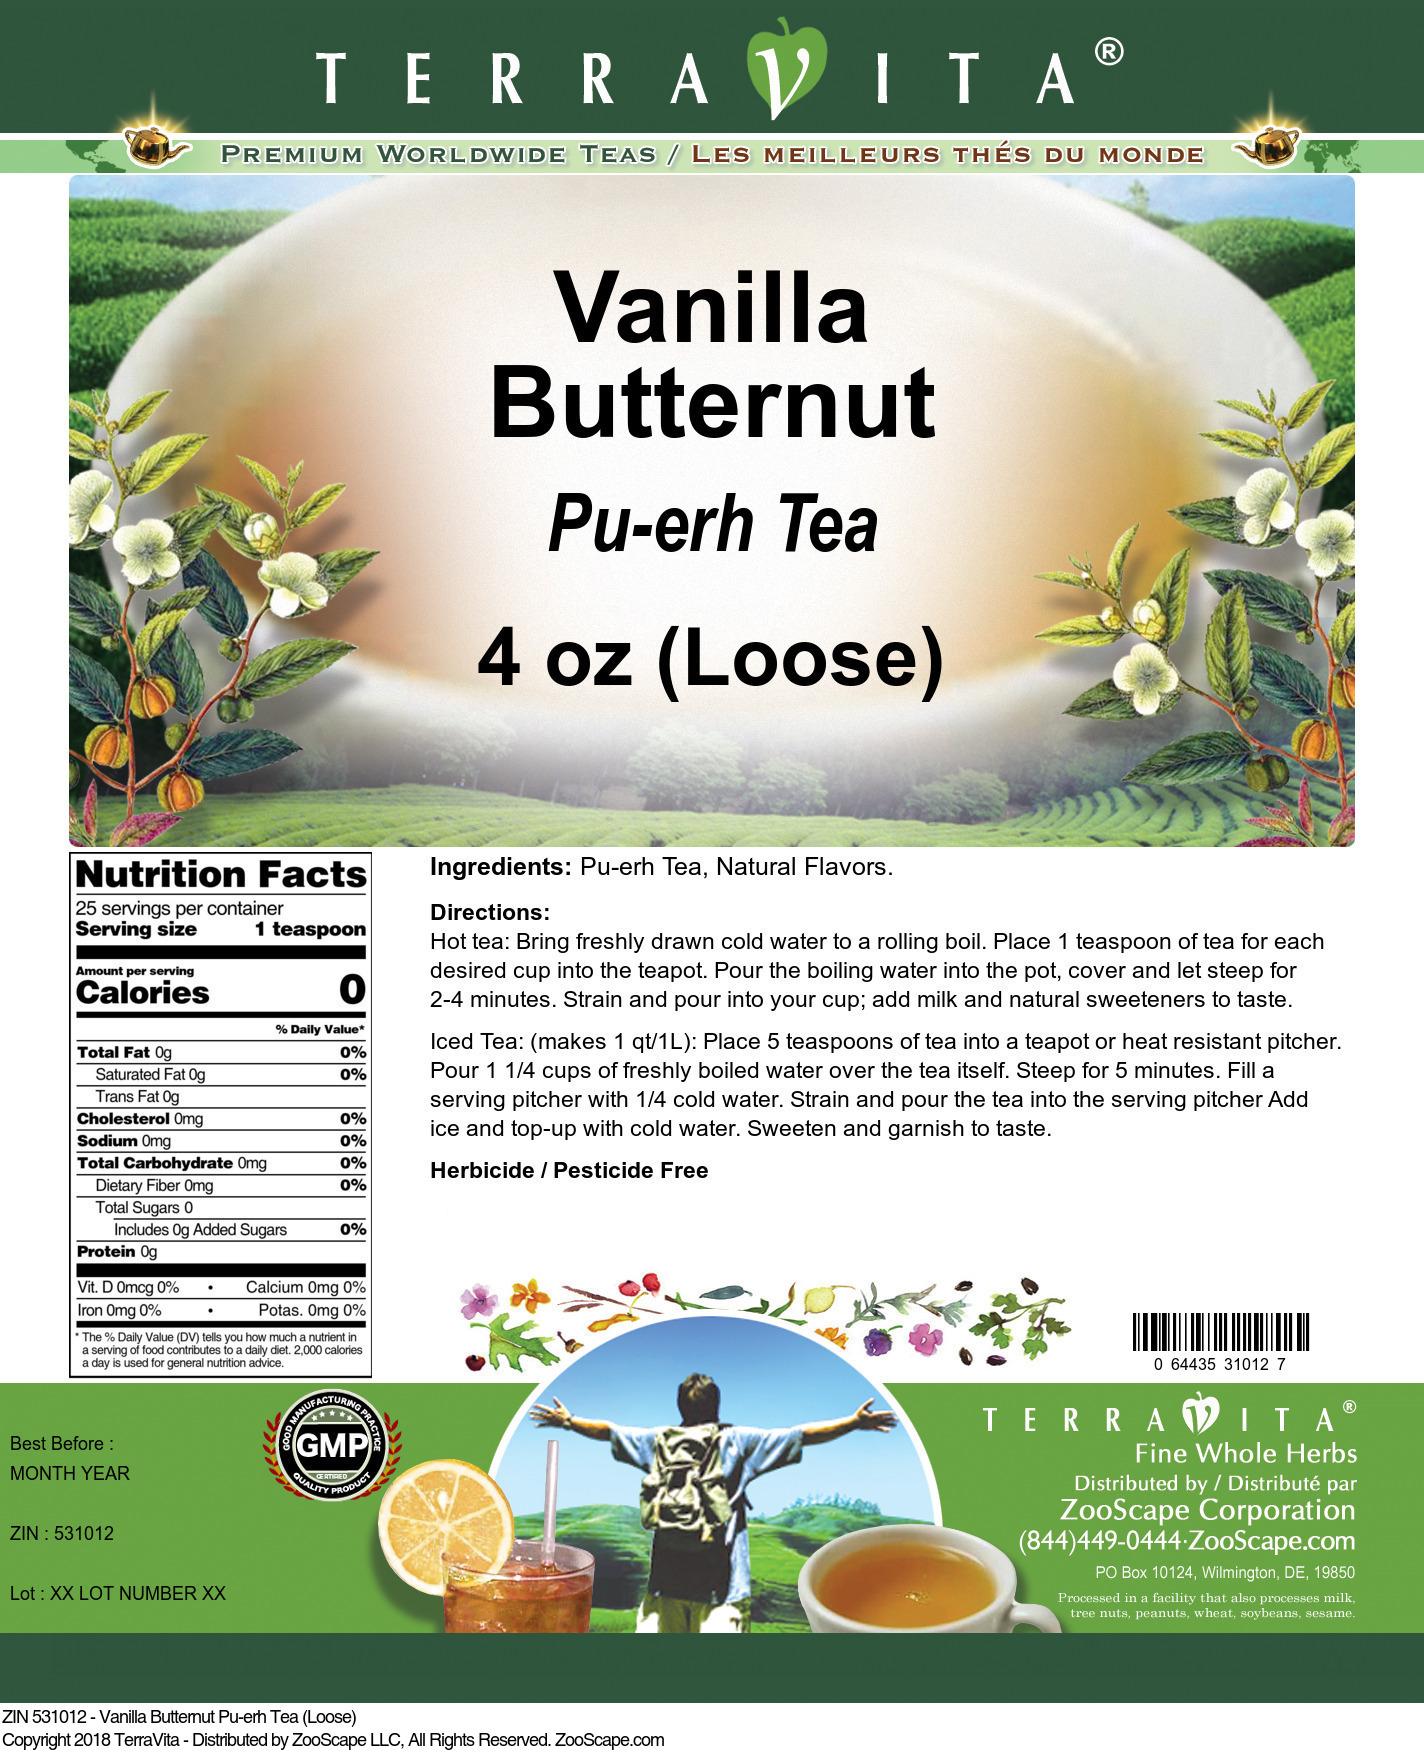 Vanilla Butternut Pu-erh Tea